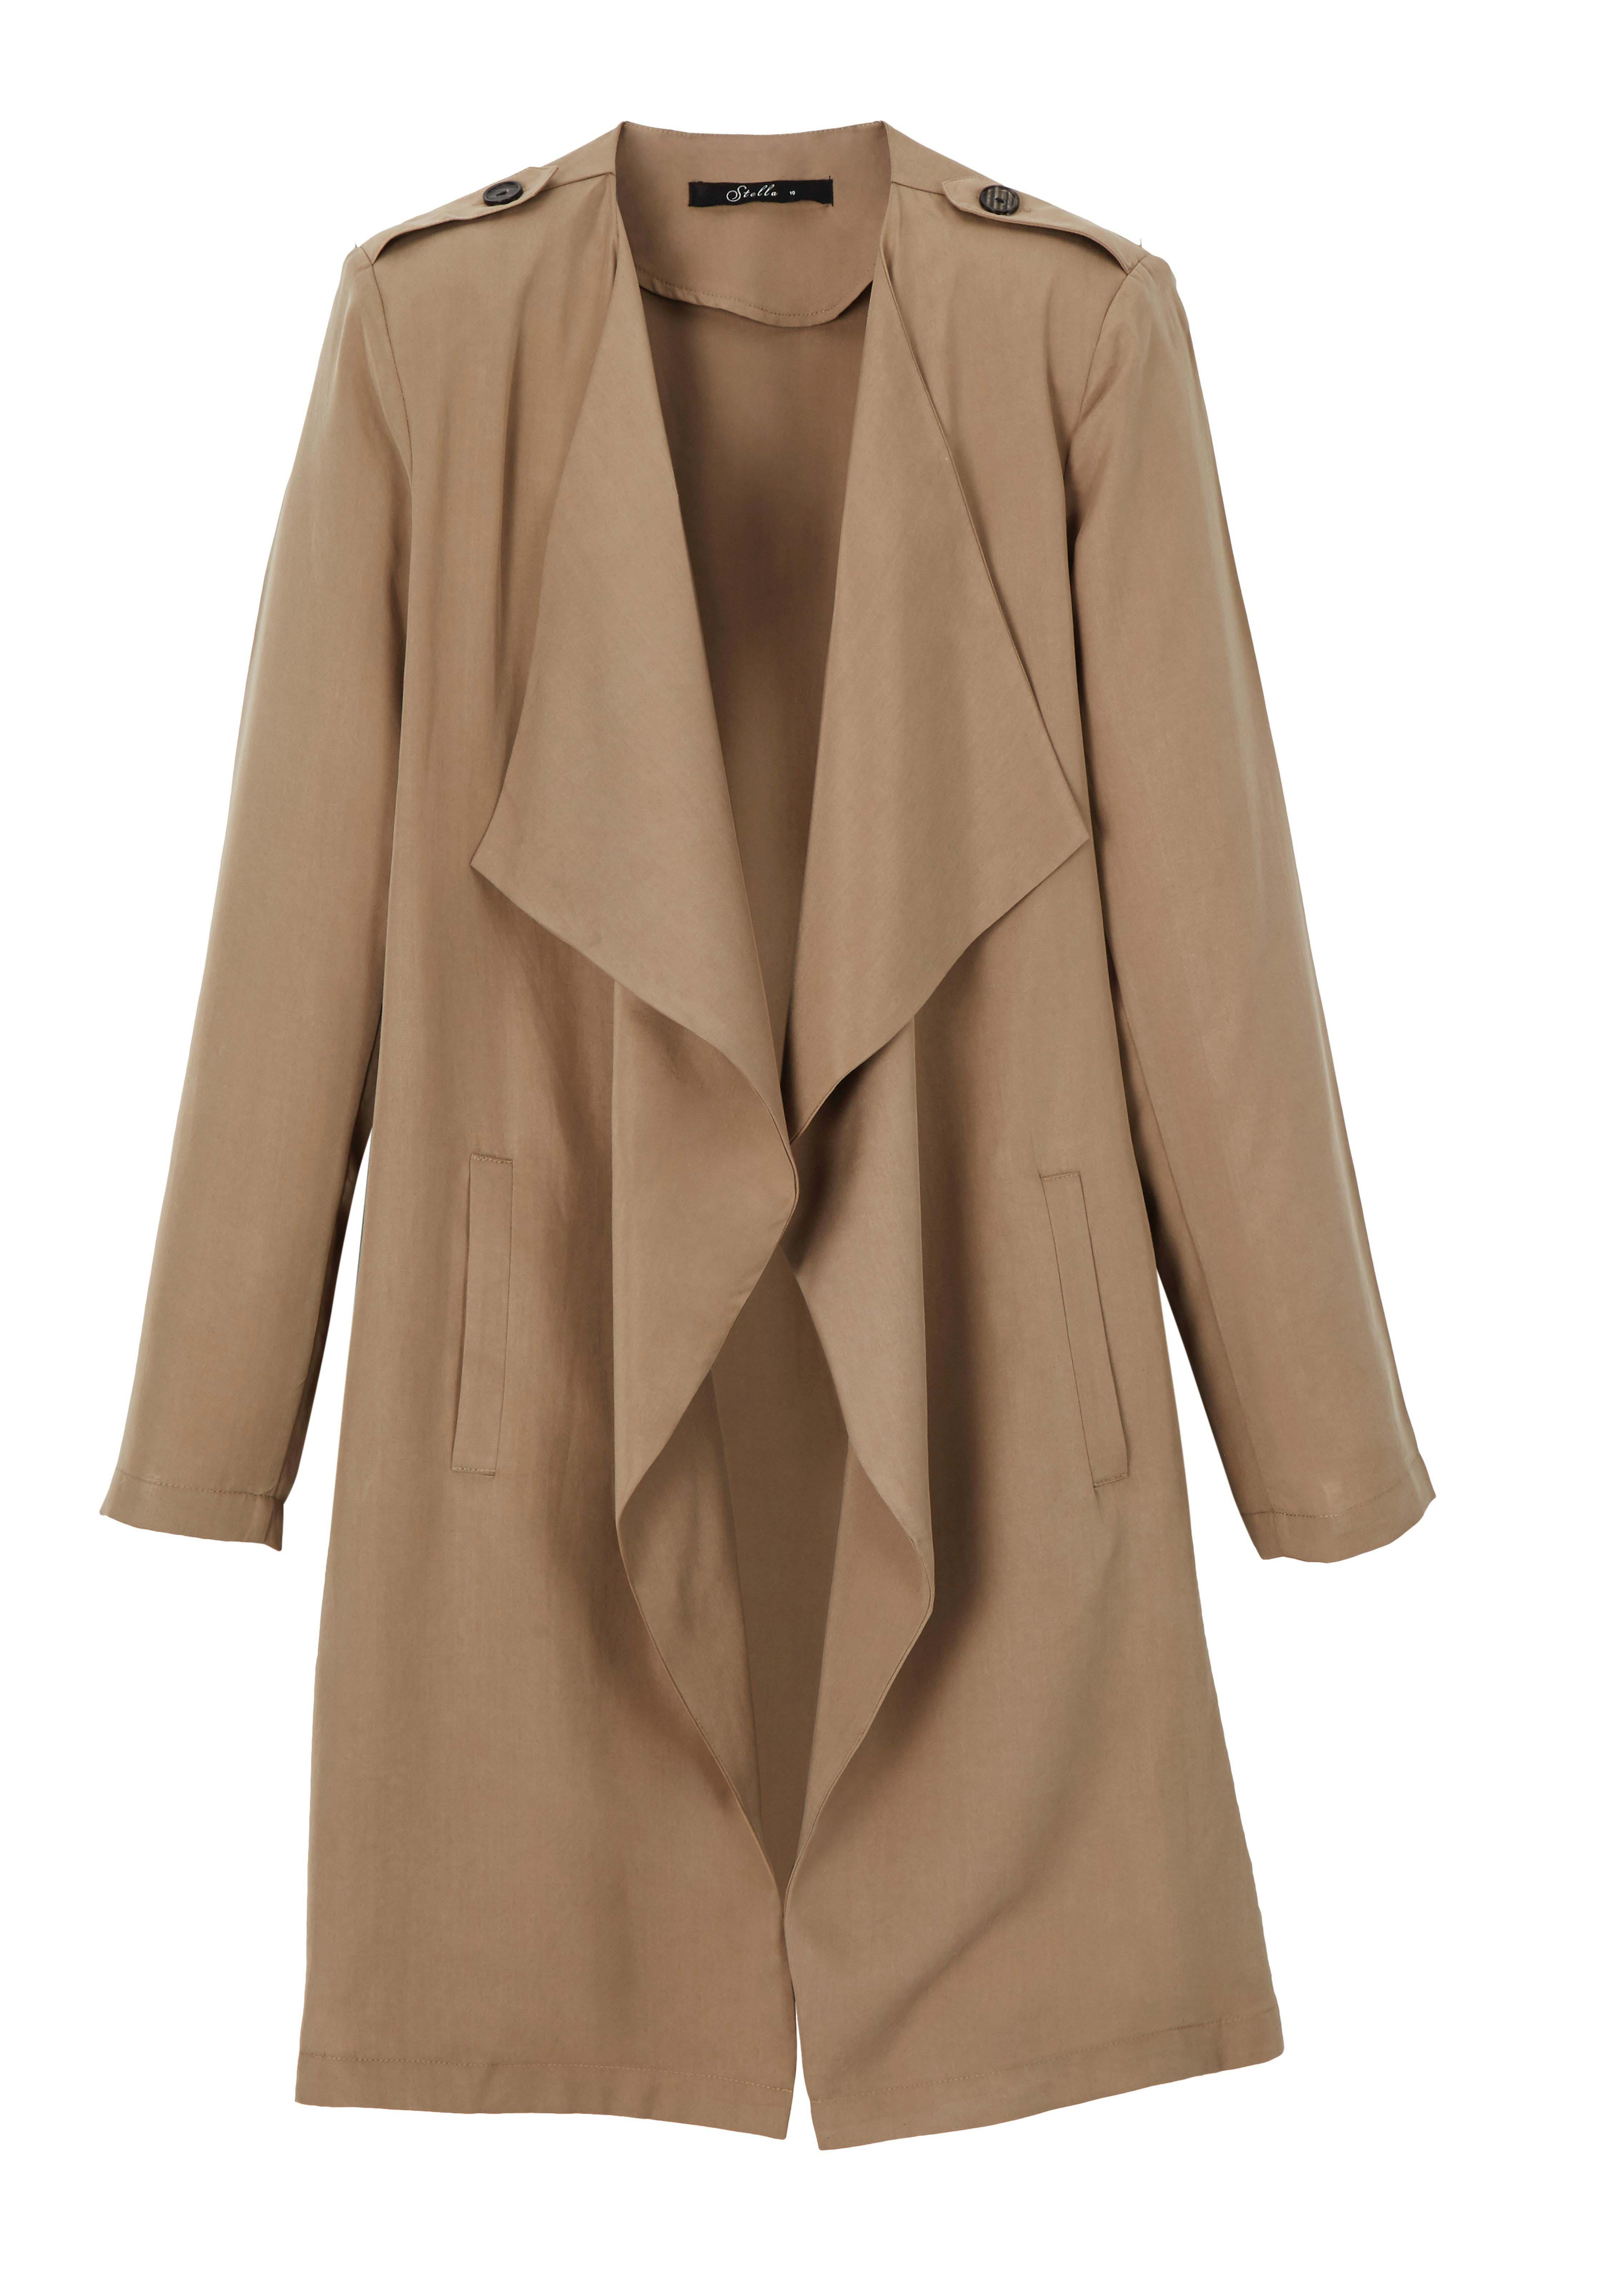 6077989 Stella Fawn Jacket $159.99 Instore Jan 18 2016